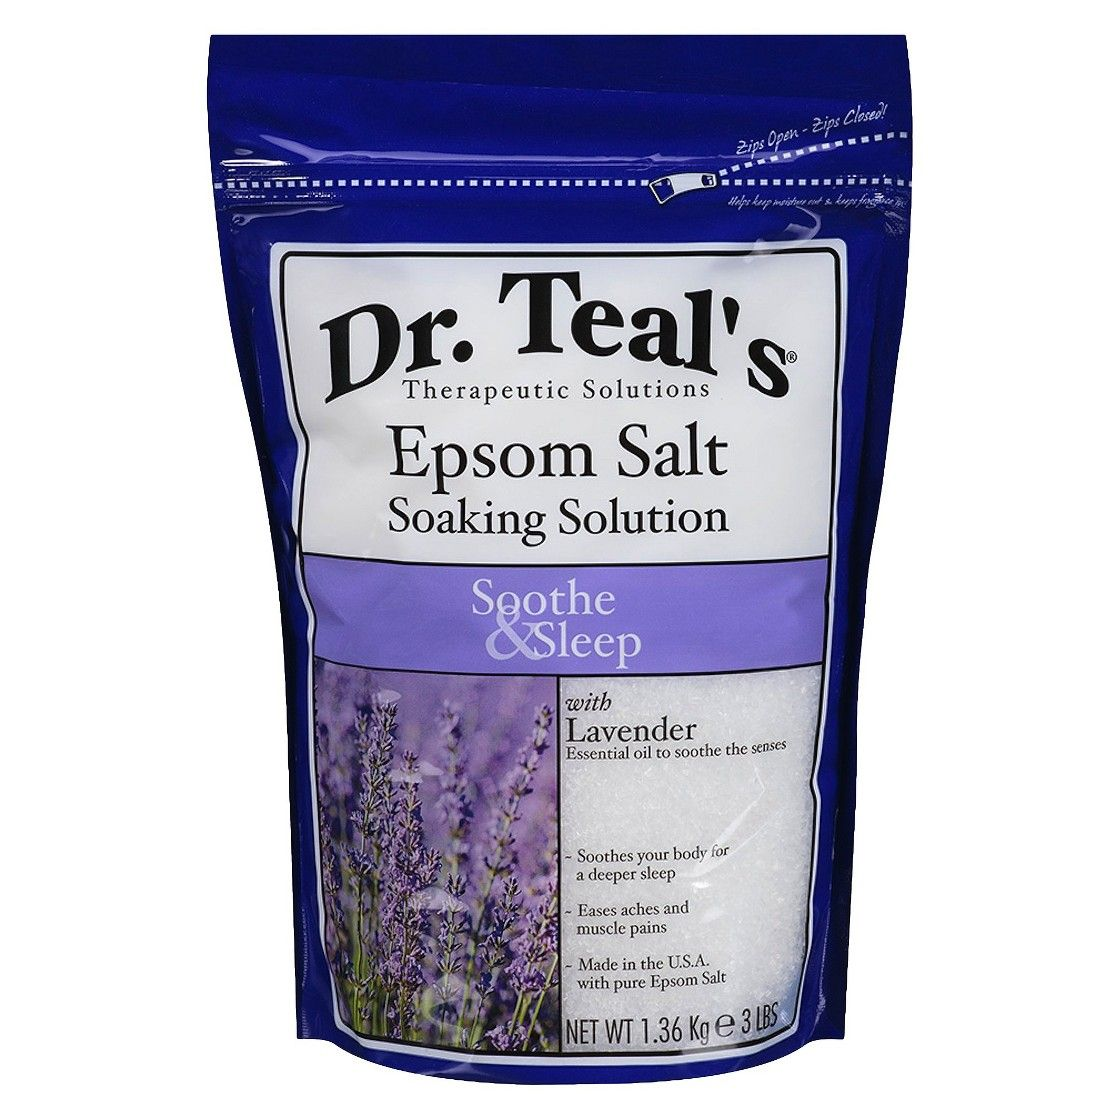 Dr Teal's Pure Epsom Salt Soothe & Sleep Lavender Soaking